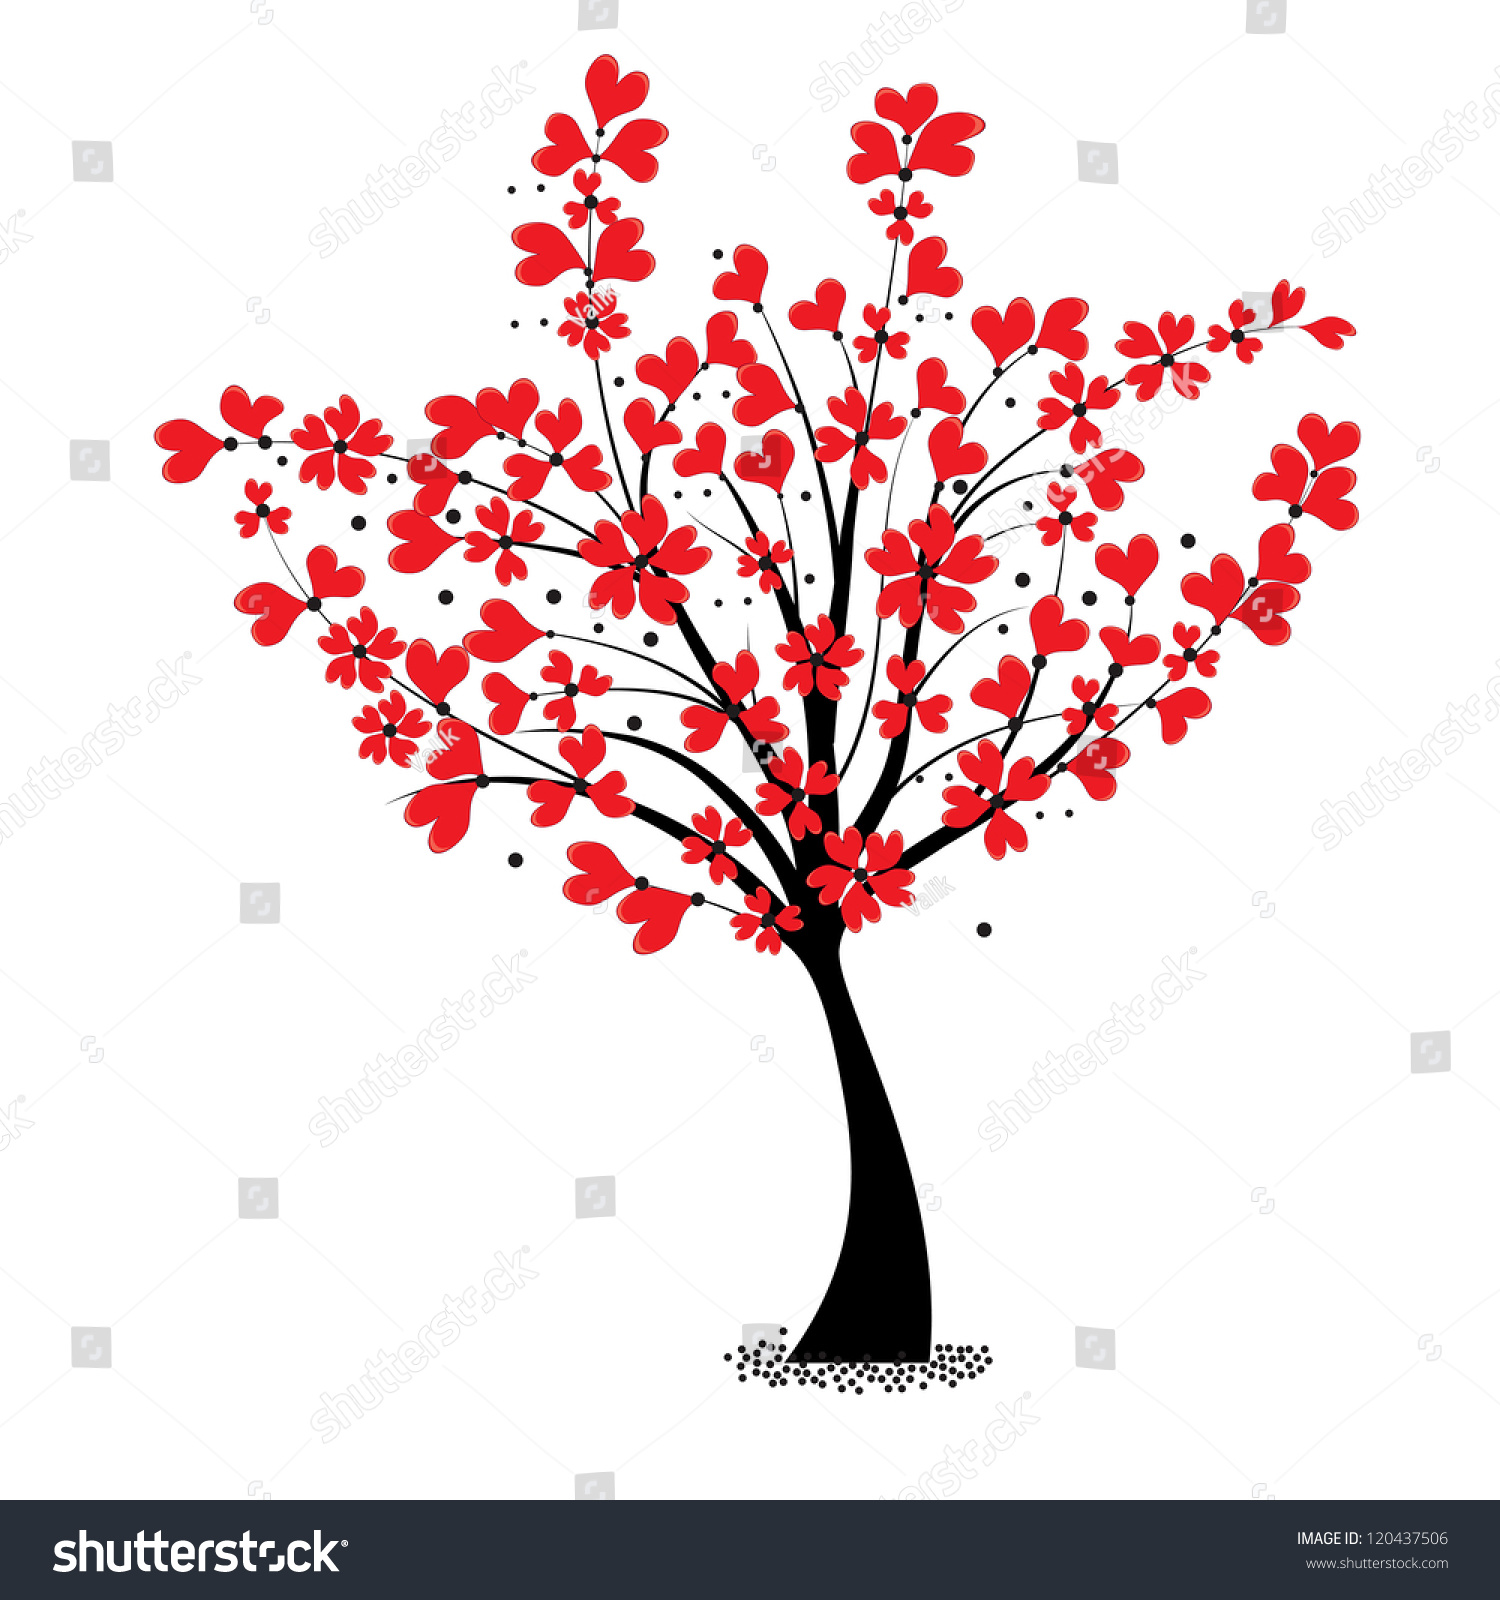 Wedding Tree Vector: Valentine Tree Vector Flower Shaped Heart Stock Vector